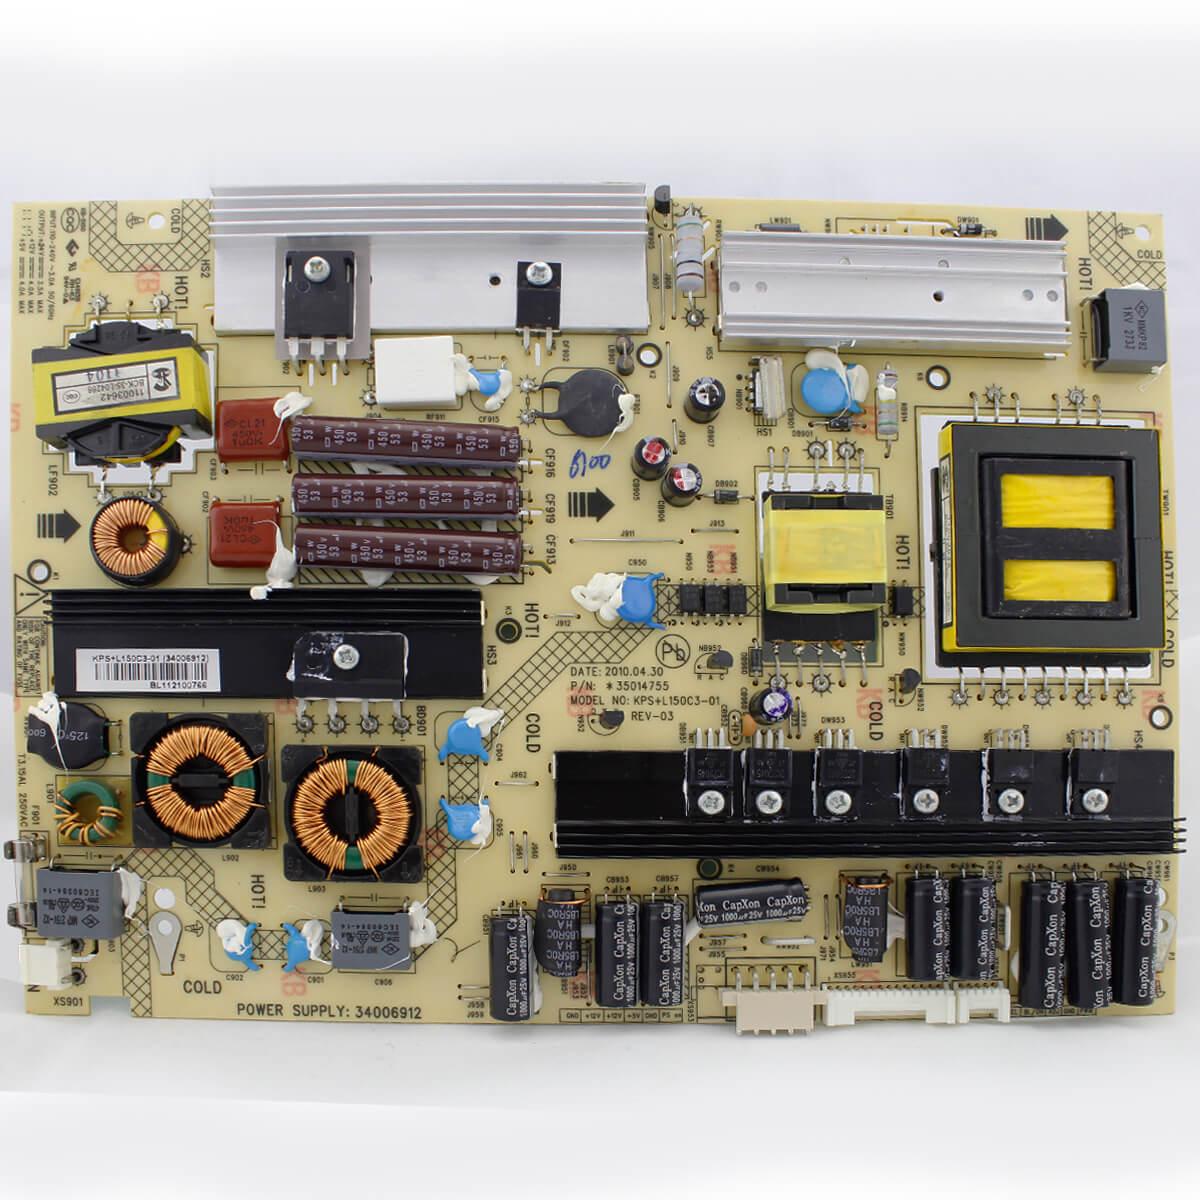 Placa Fonte TV Toshiba Pn KPS+L150C3-01 - Nova